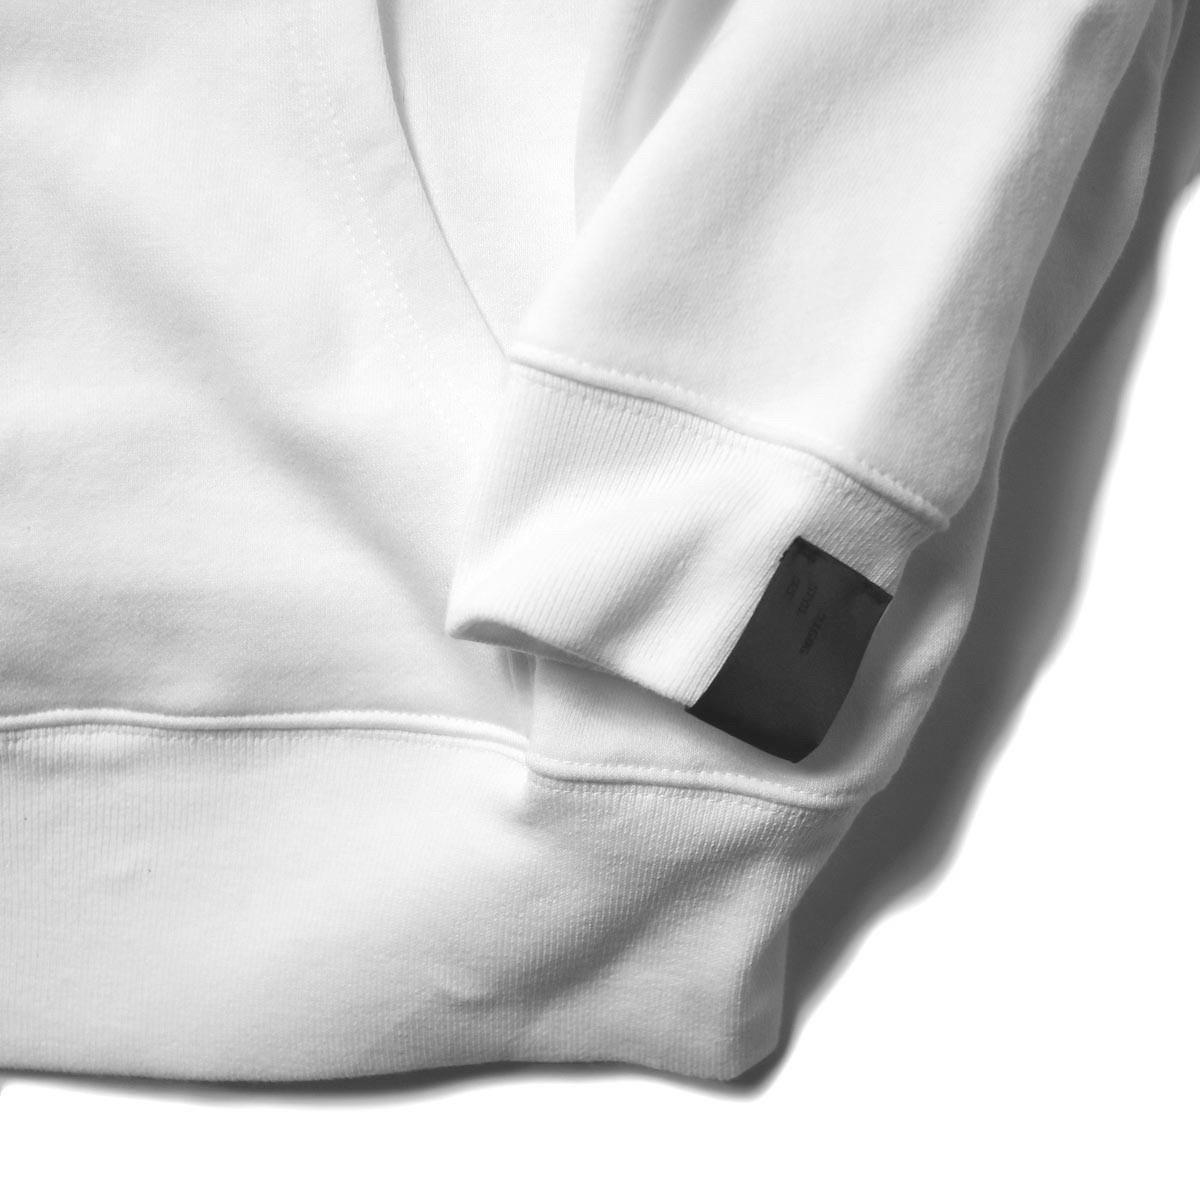 N.HOOLYWOOD / 2202-CS80-033 Sweat Hoodie (White) 袖、裾